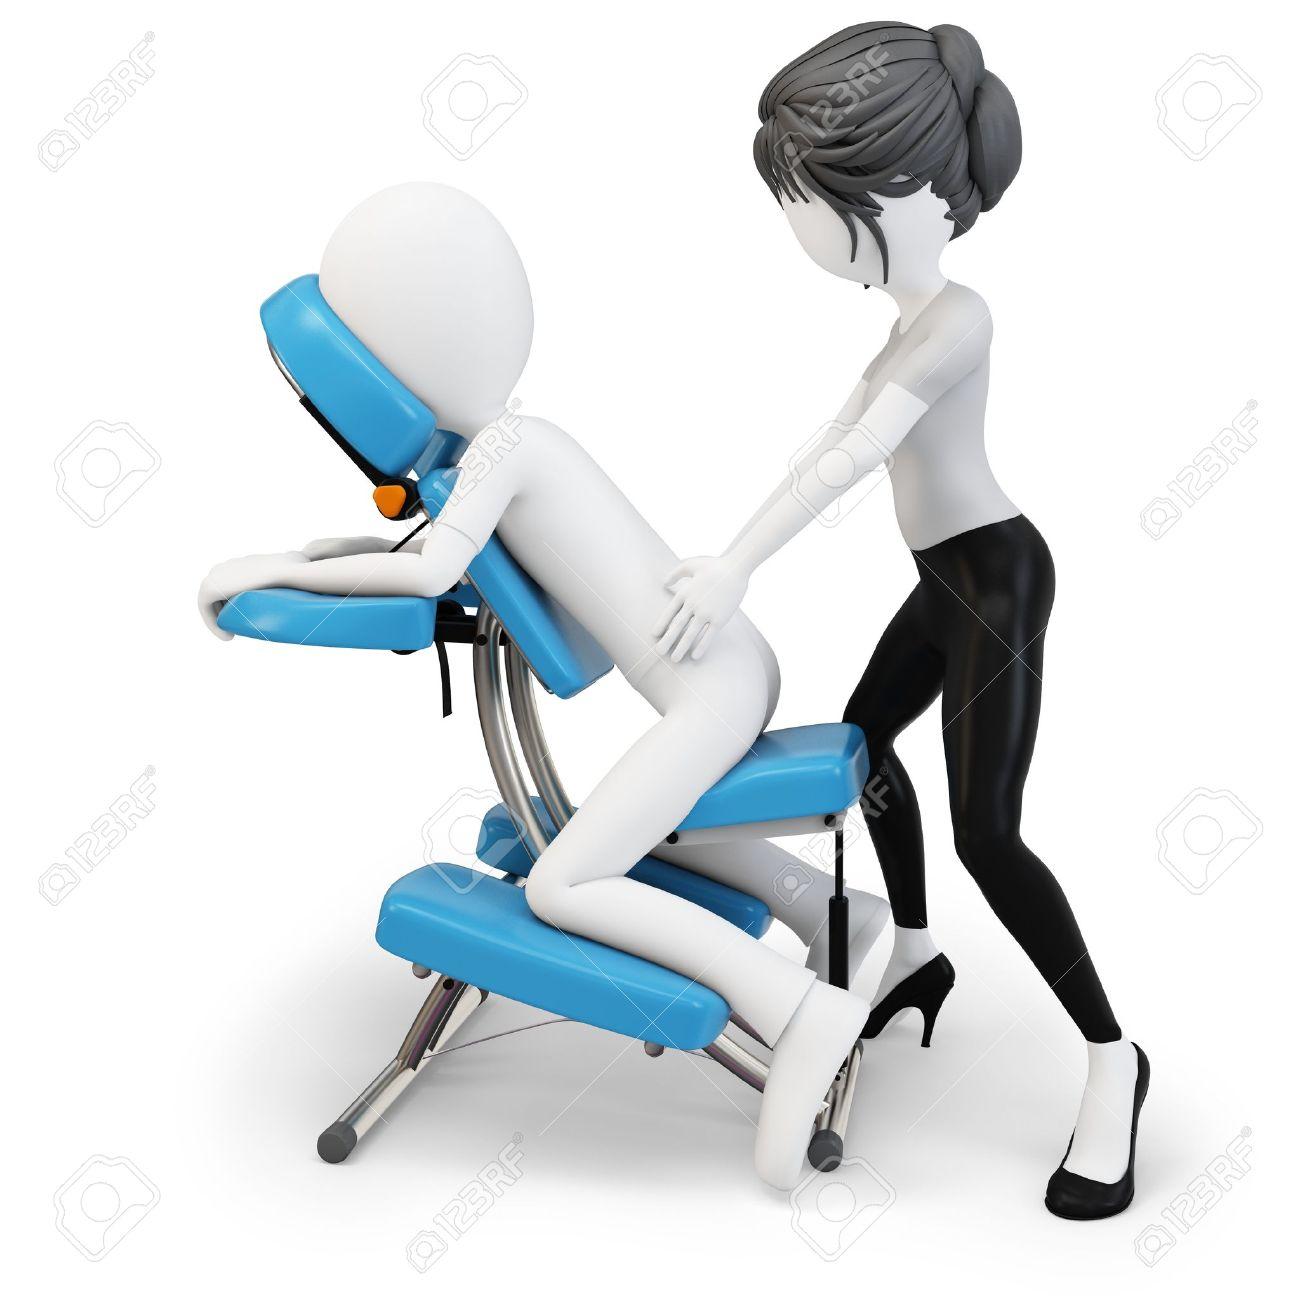 Massage Chair: Chair Massage Clip Art and Illustration Clip Art.